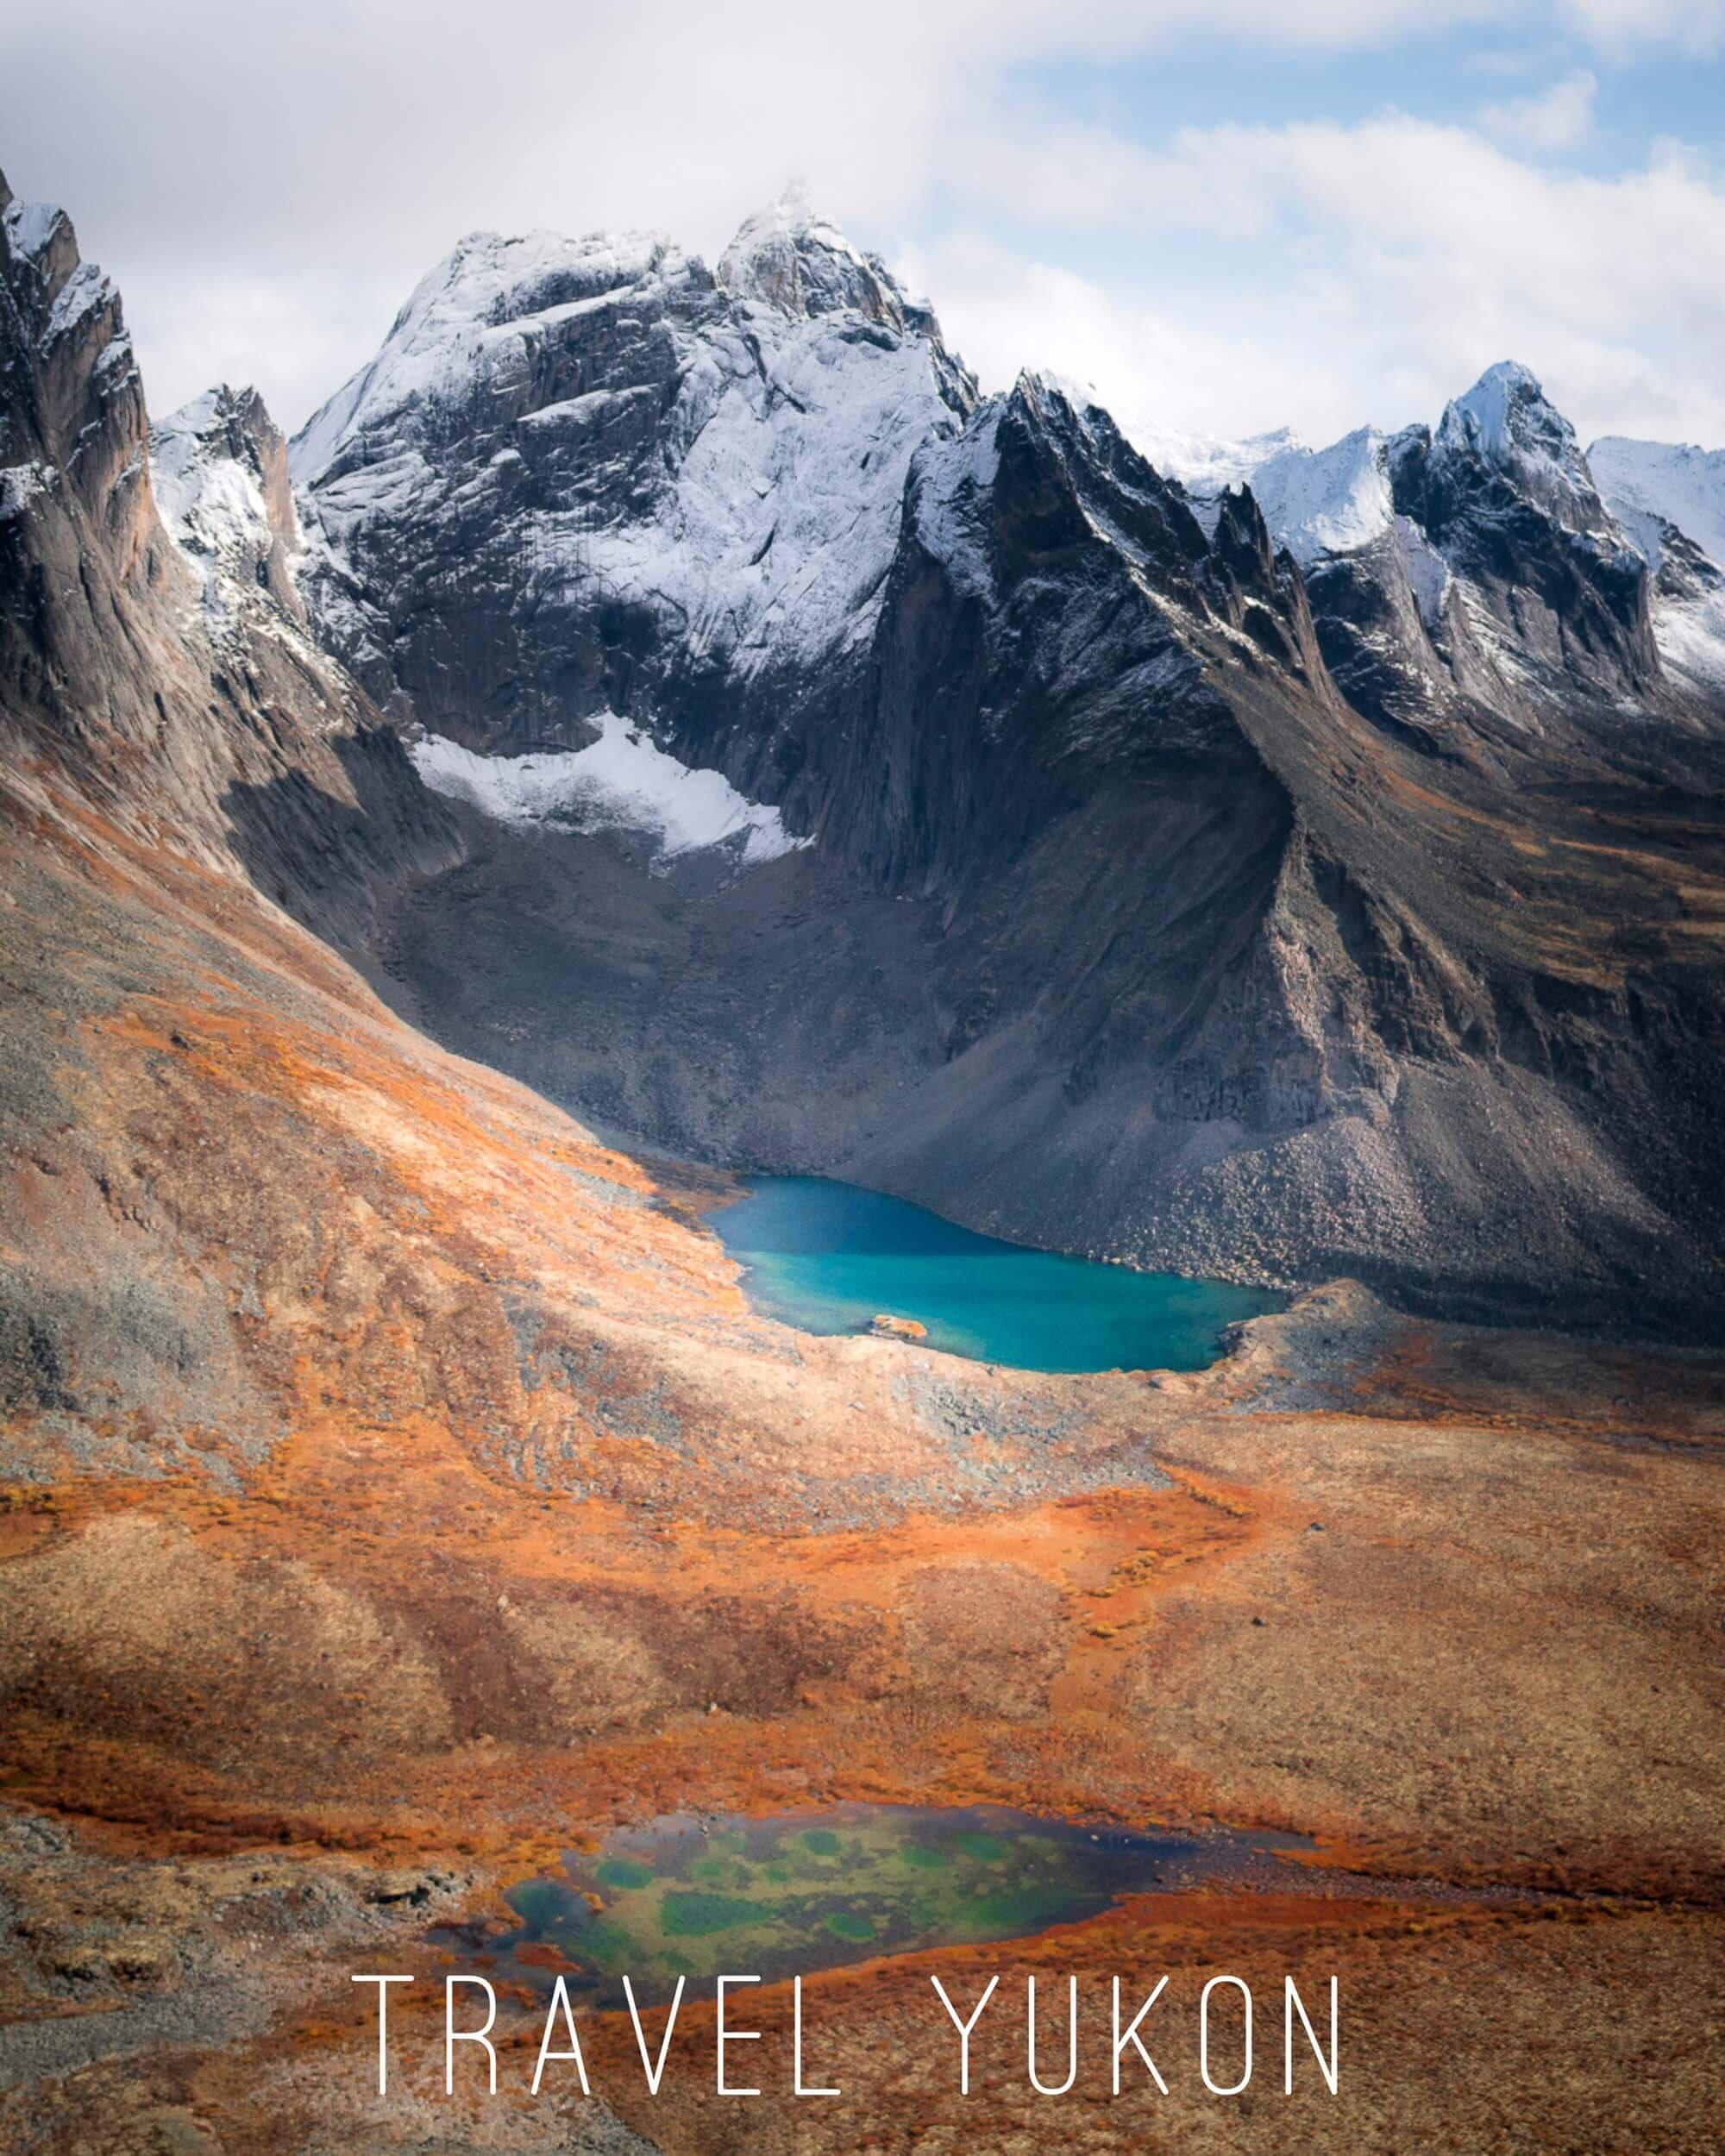 Jess Wandering and Travel Yukon